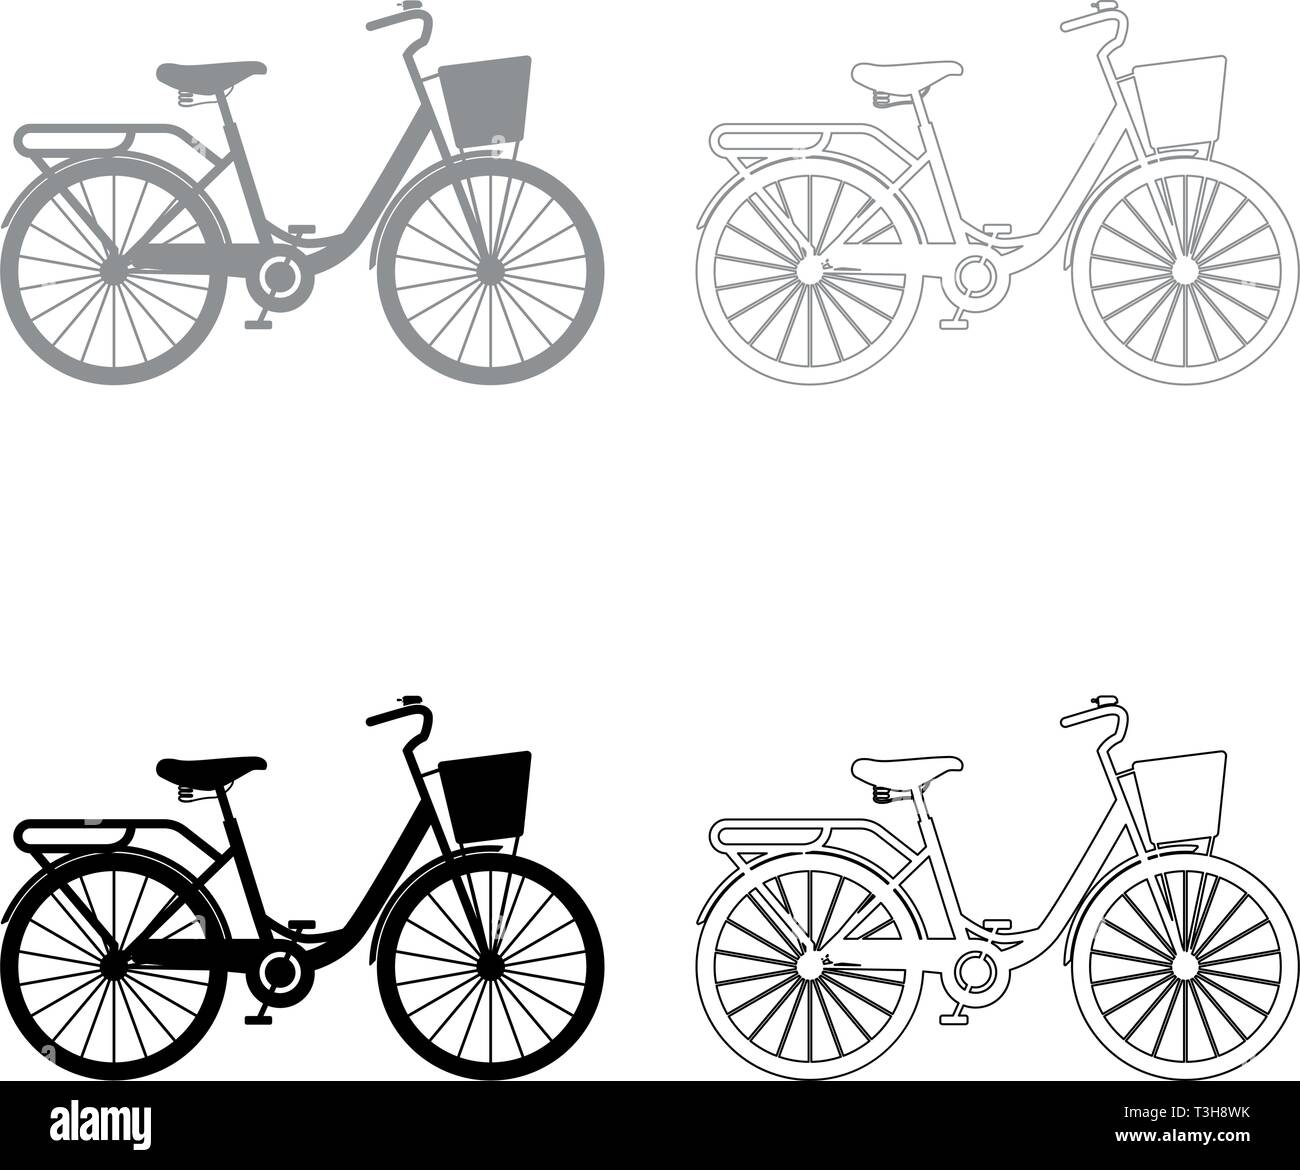 Woman's bicycle with basket Womens beach cruiser bike Vintage bicycle basket ladies road cruising icon set black grey color vector illustration flat - Stock Image